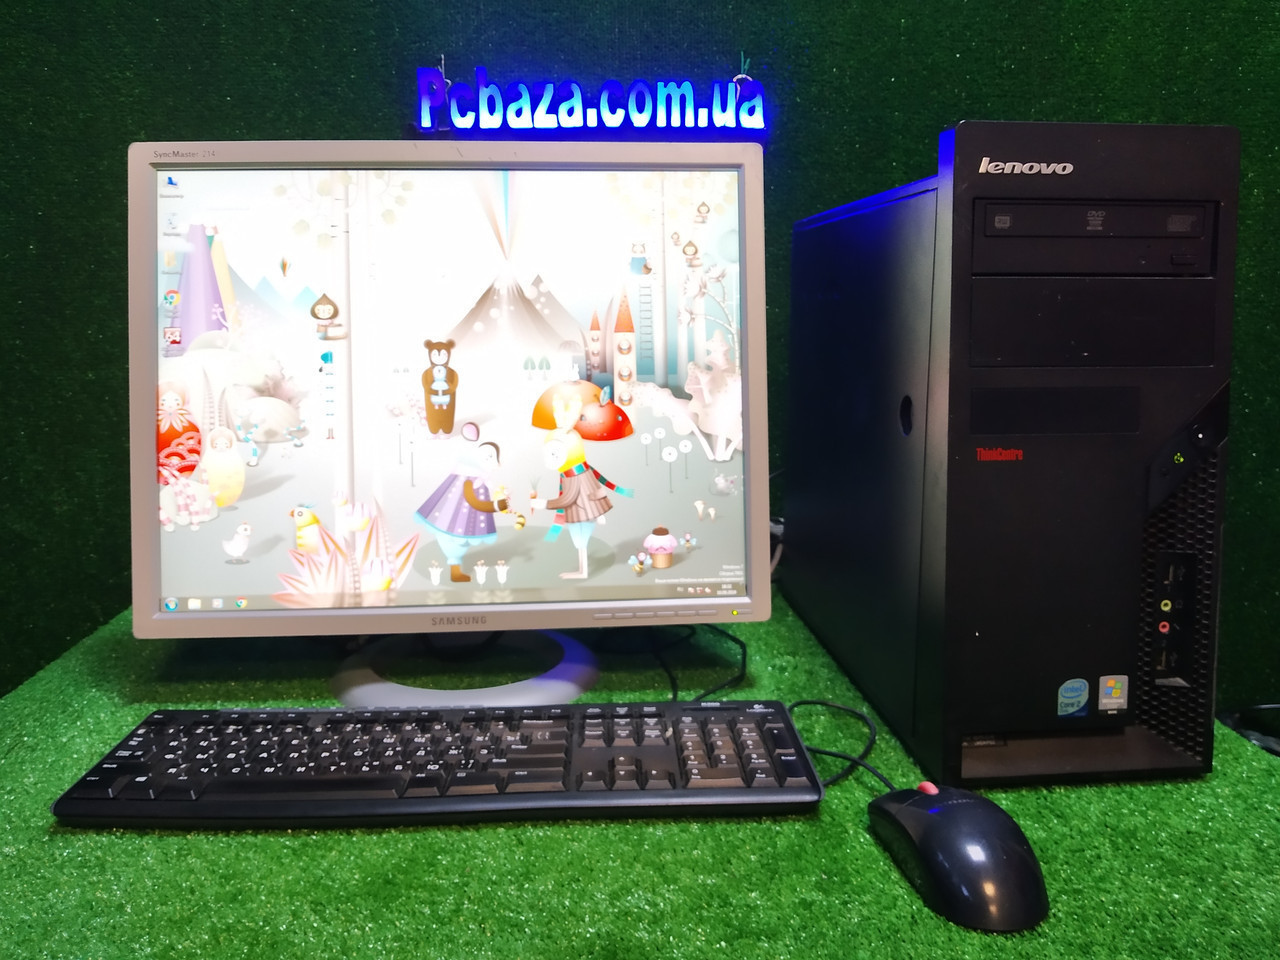 "Комплект игровой  Lenovo, 4 ядра, 4 ГБ, 500 Гб HDD, Quadro 2000 1GB (GTS 450) + 22"" монитор Samsung  214t"